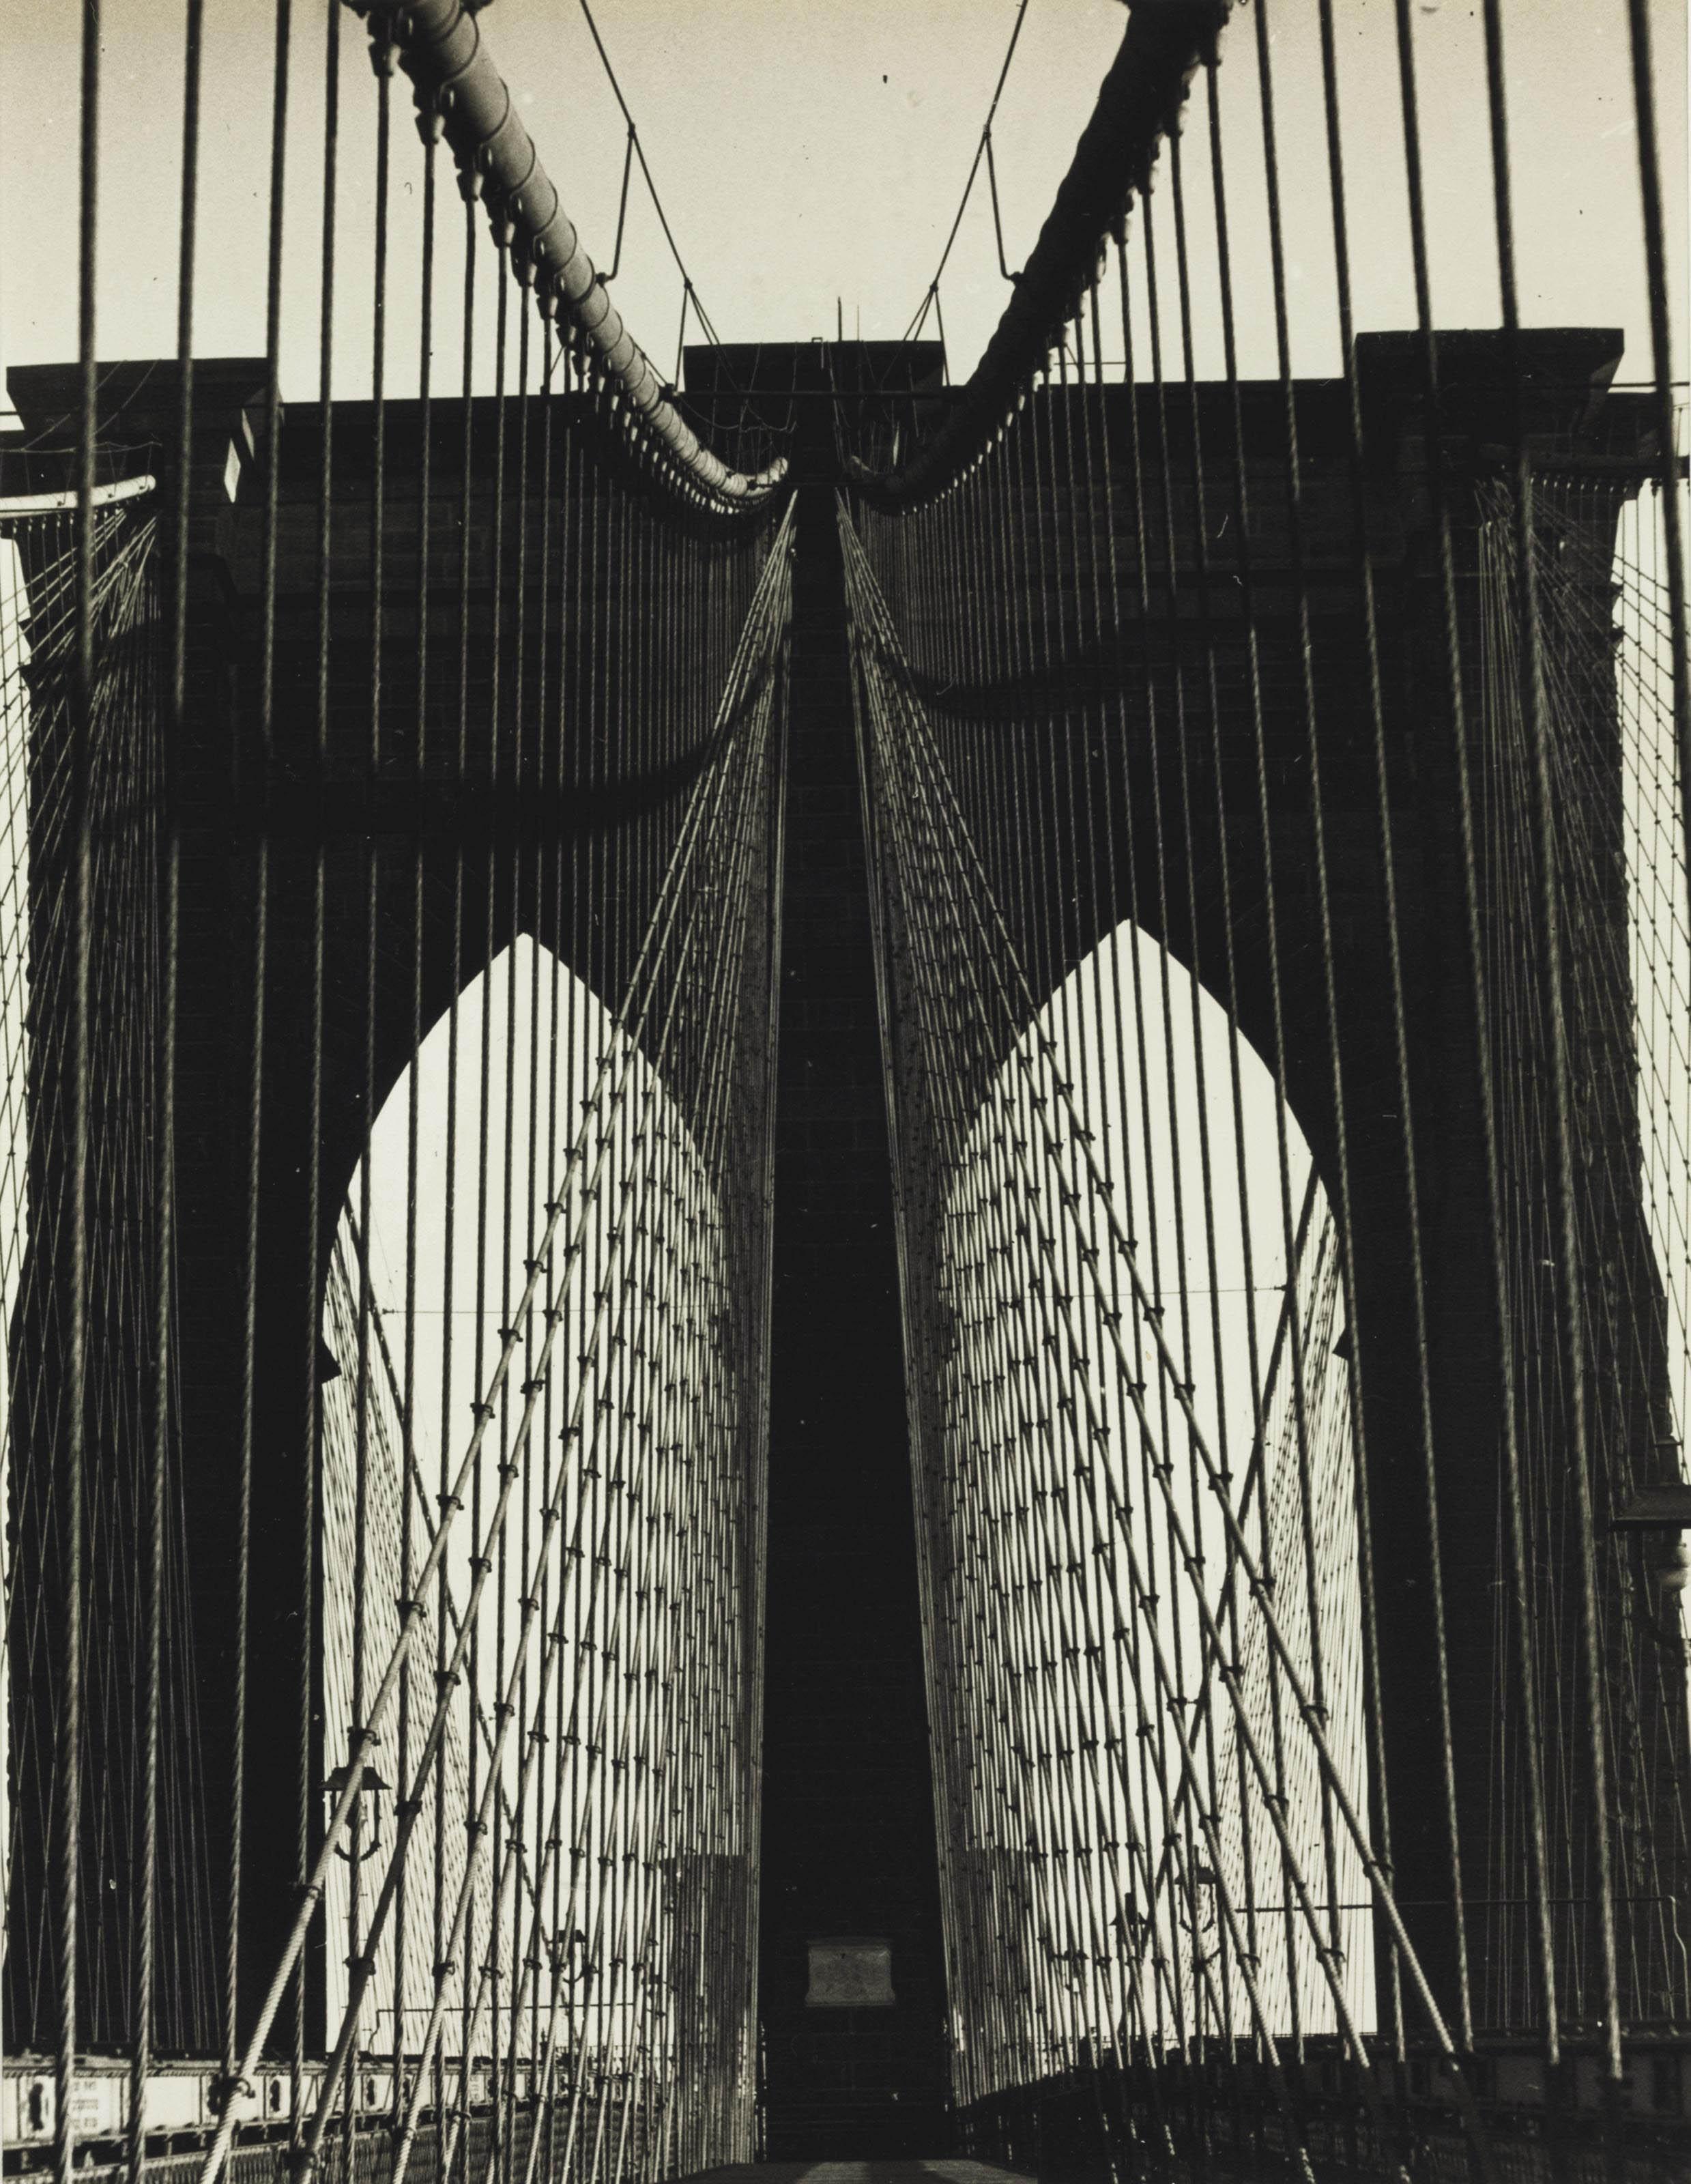 Brooklyn Bridge; and Lower East Side, 1947